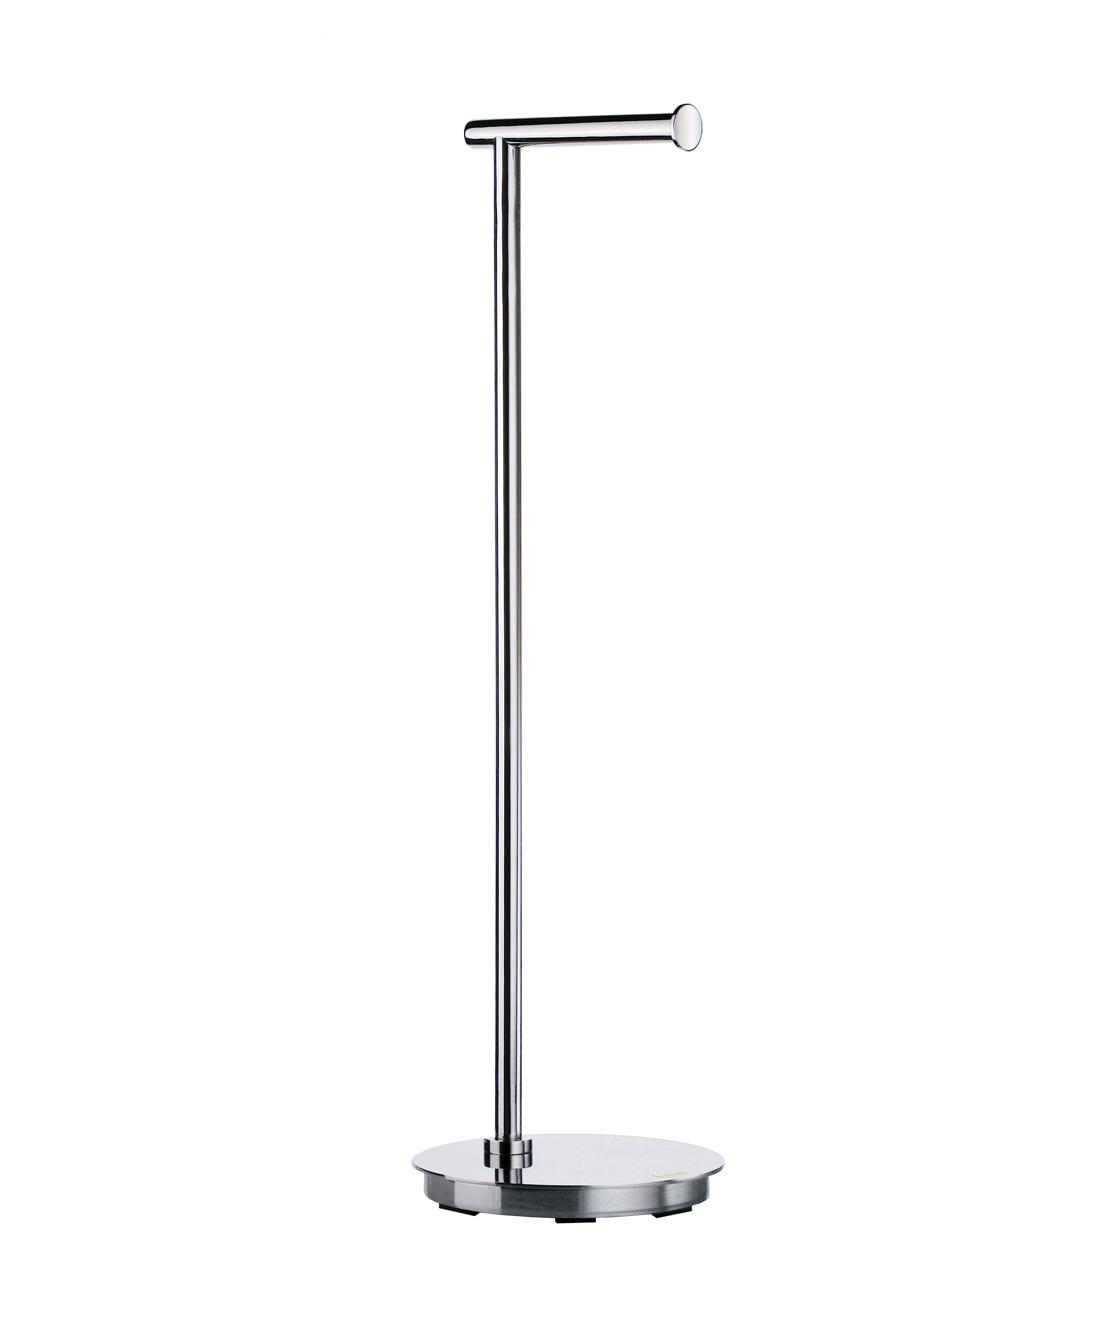 smedbo outline lite free standing toilet roll holder round base -